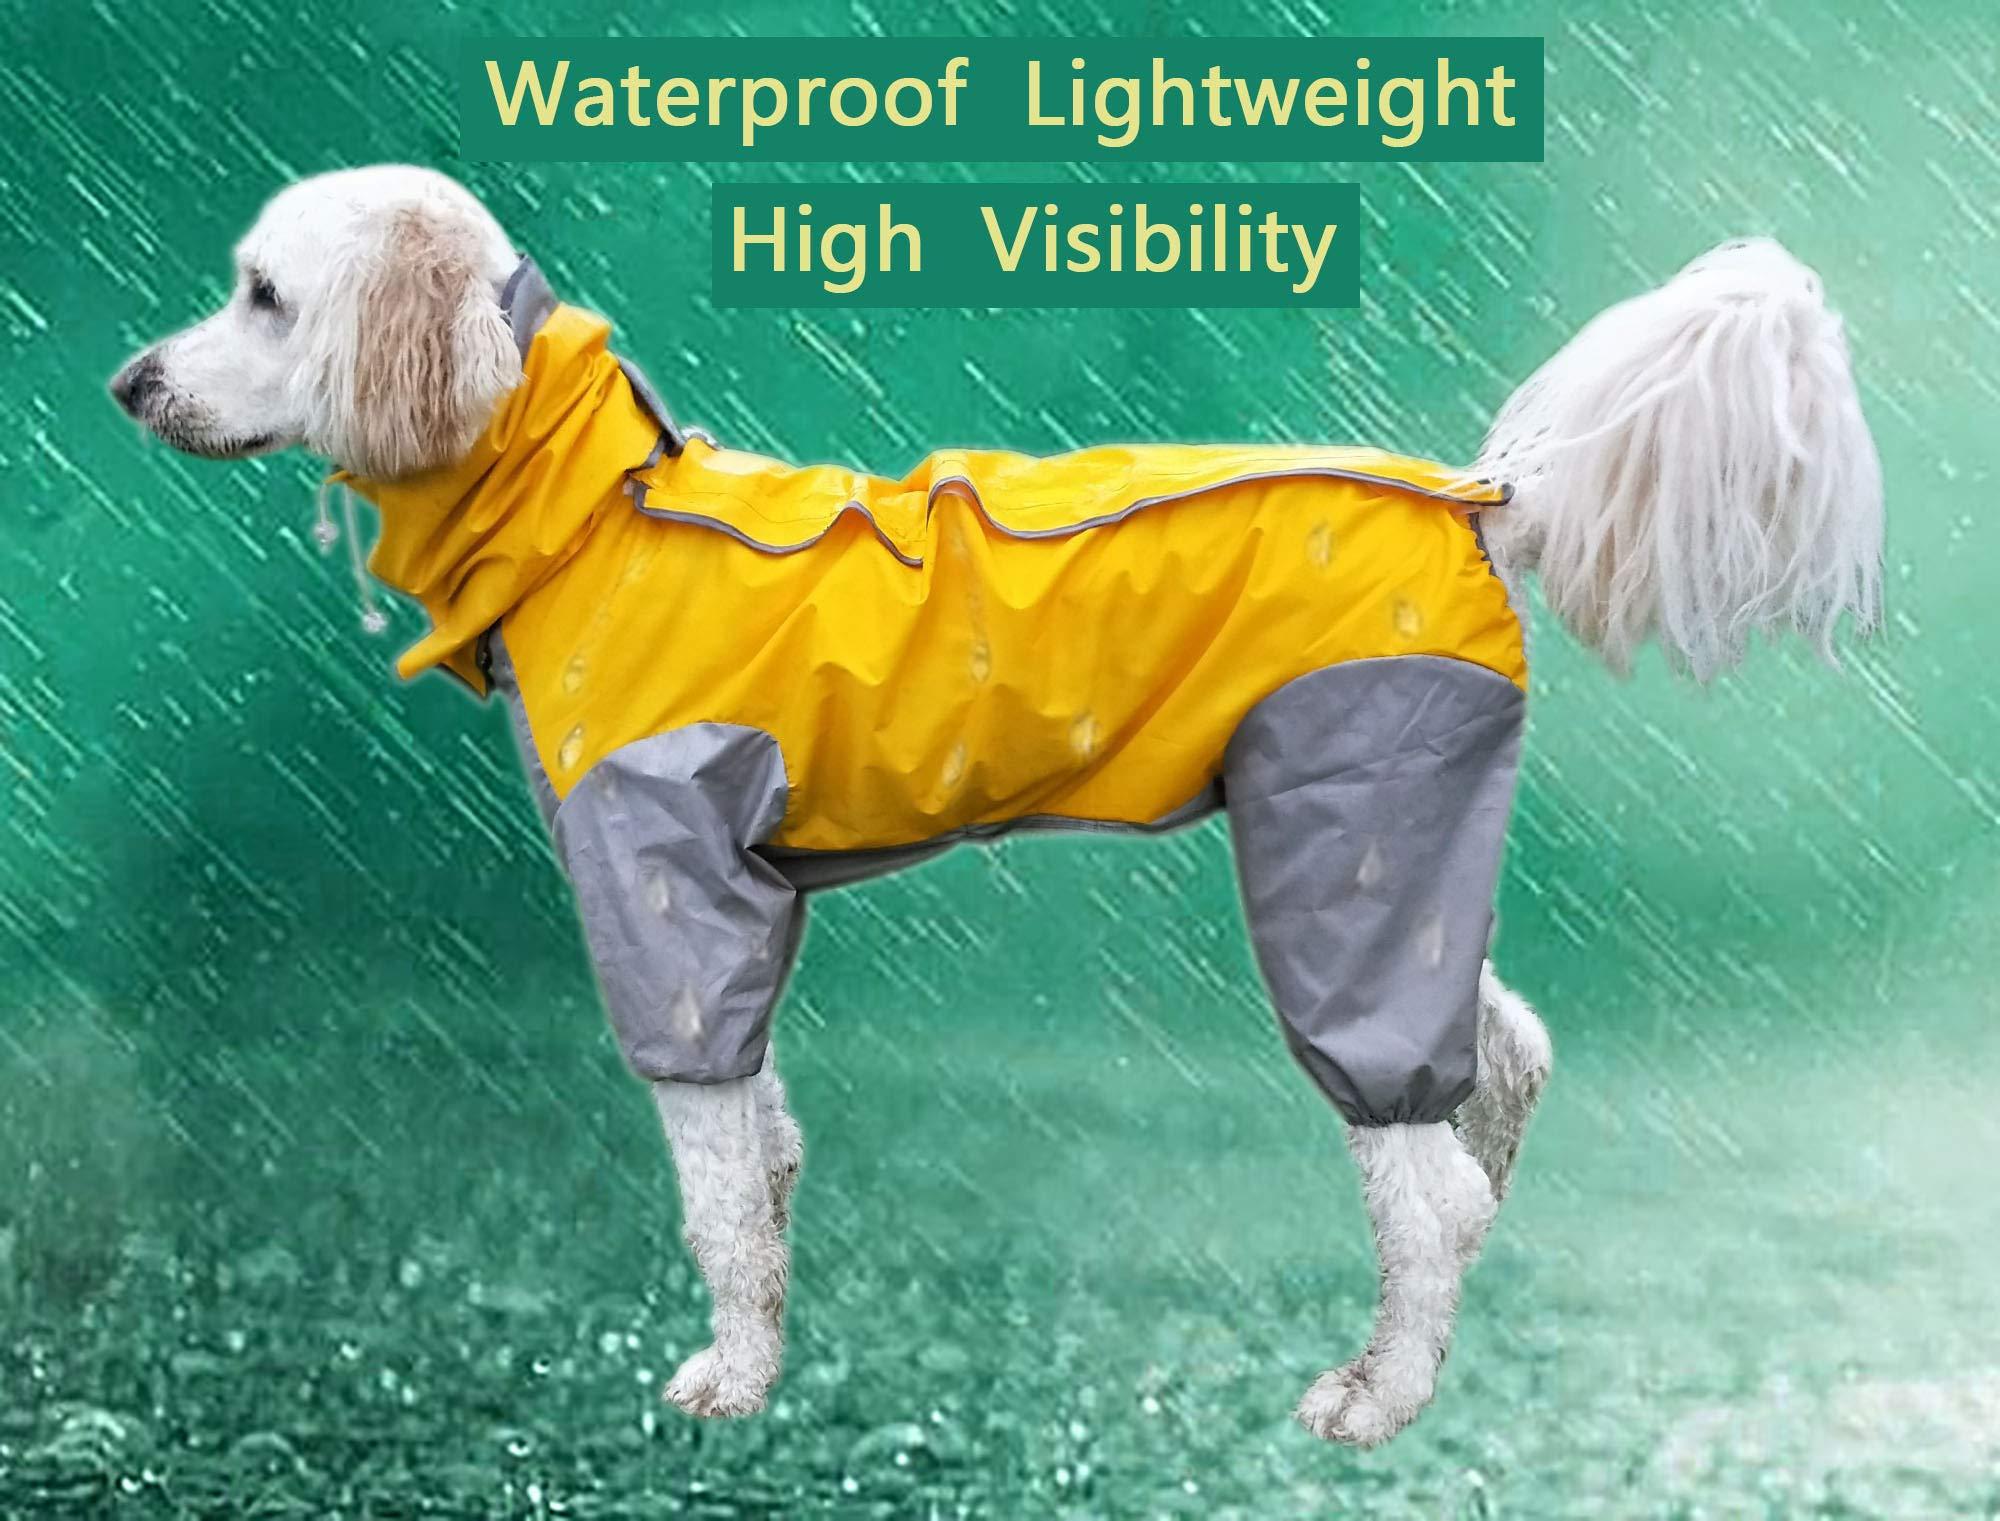 MASKOTA Dog Raincoats Waterproof Lightweight & High Visibility Full Range Sizes for Large Medium Small All Breeds Poncho Hoodies by MASKOTA